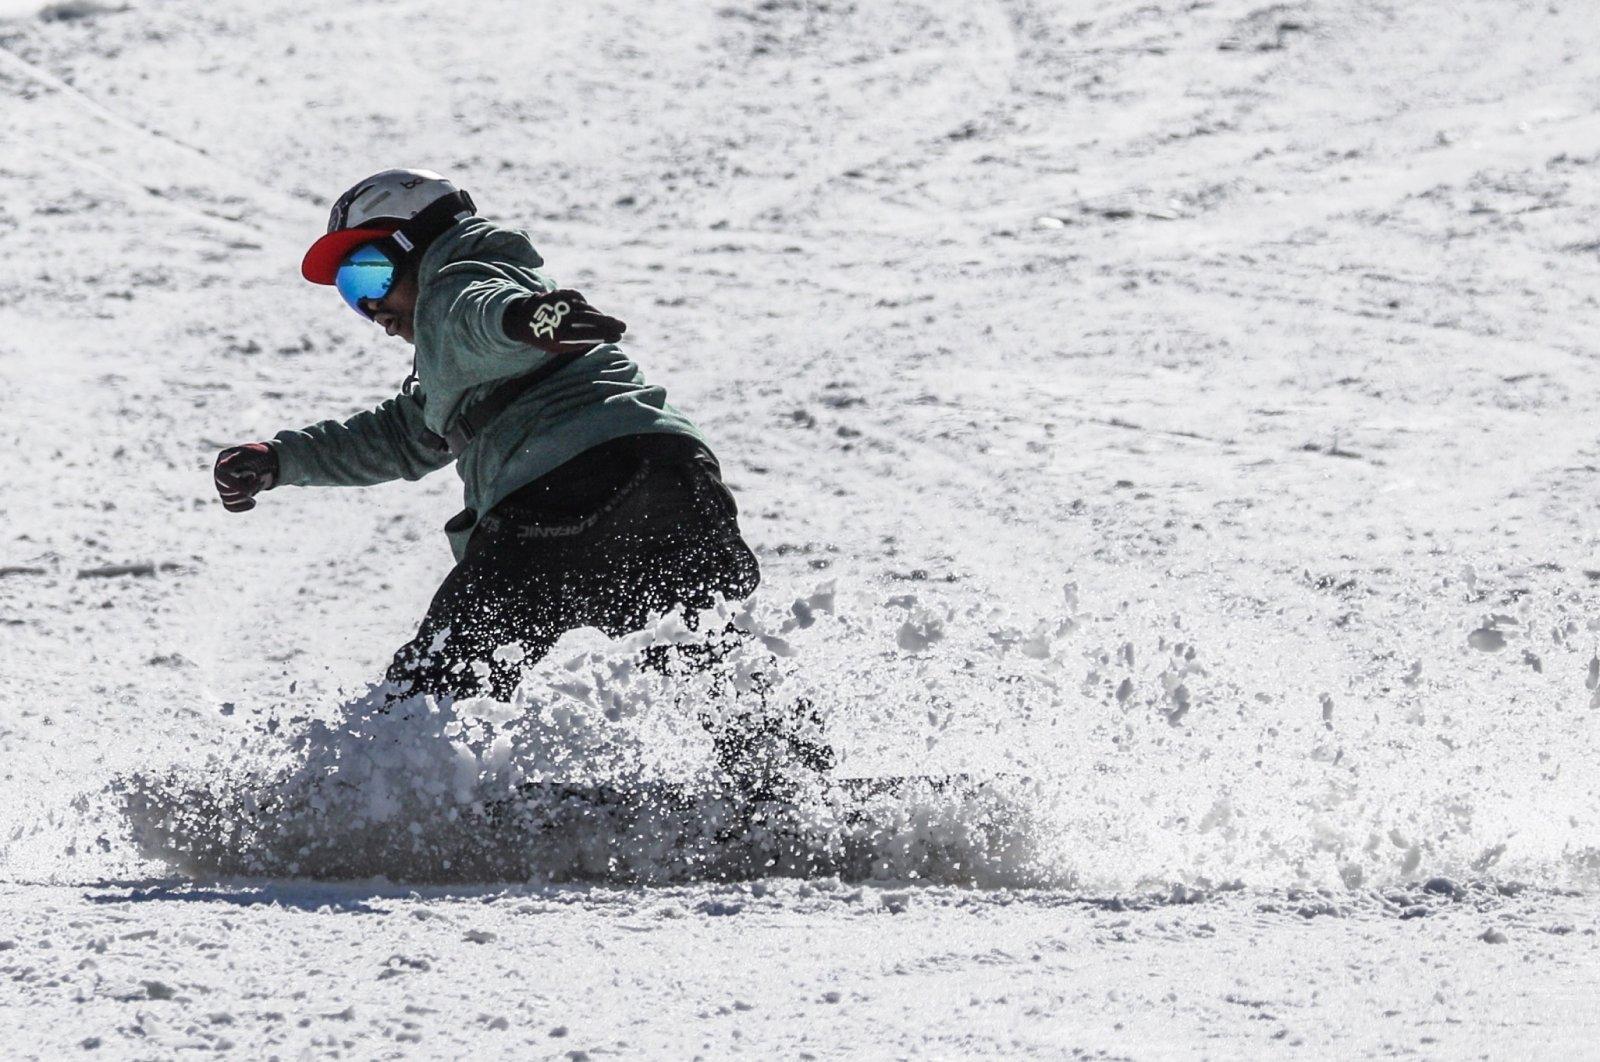 Hope Ramokotjo snowboards at Kapoko Snow Park at Afriski Mountain Resort in Butha Buthe, Lesotho, July 31, 2021. (Reuters Photo)